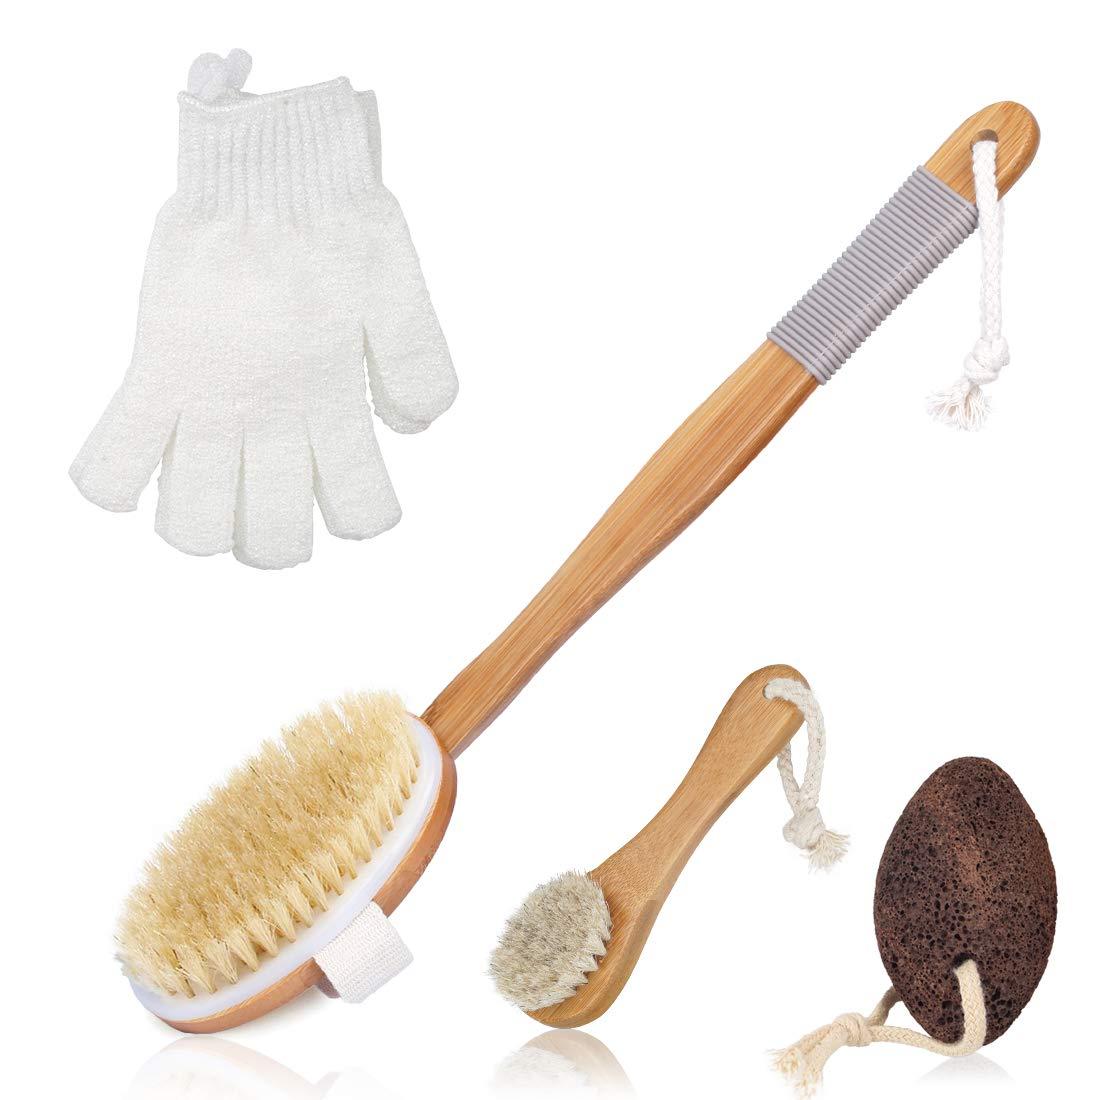 Dry Brushing Body Brush for Cellulite Lymphatic Body Brush Premium Natural Dry Skin Brush Set Detachable Long Bamboo Handle Exfoliating Brush Scrub Gloves Face Brush Pumice Stone Glowing Youthful Skin LIBOSA